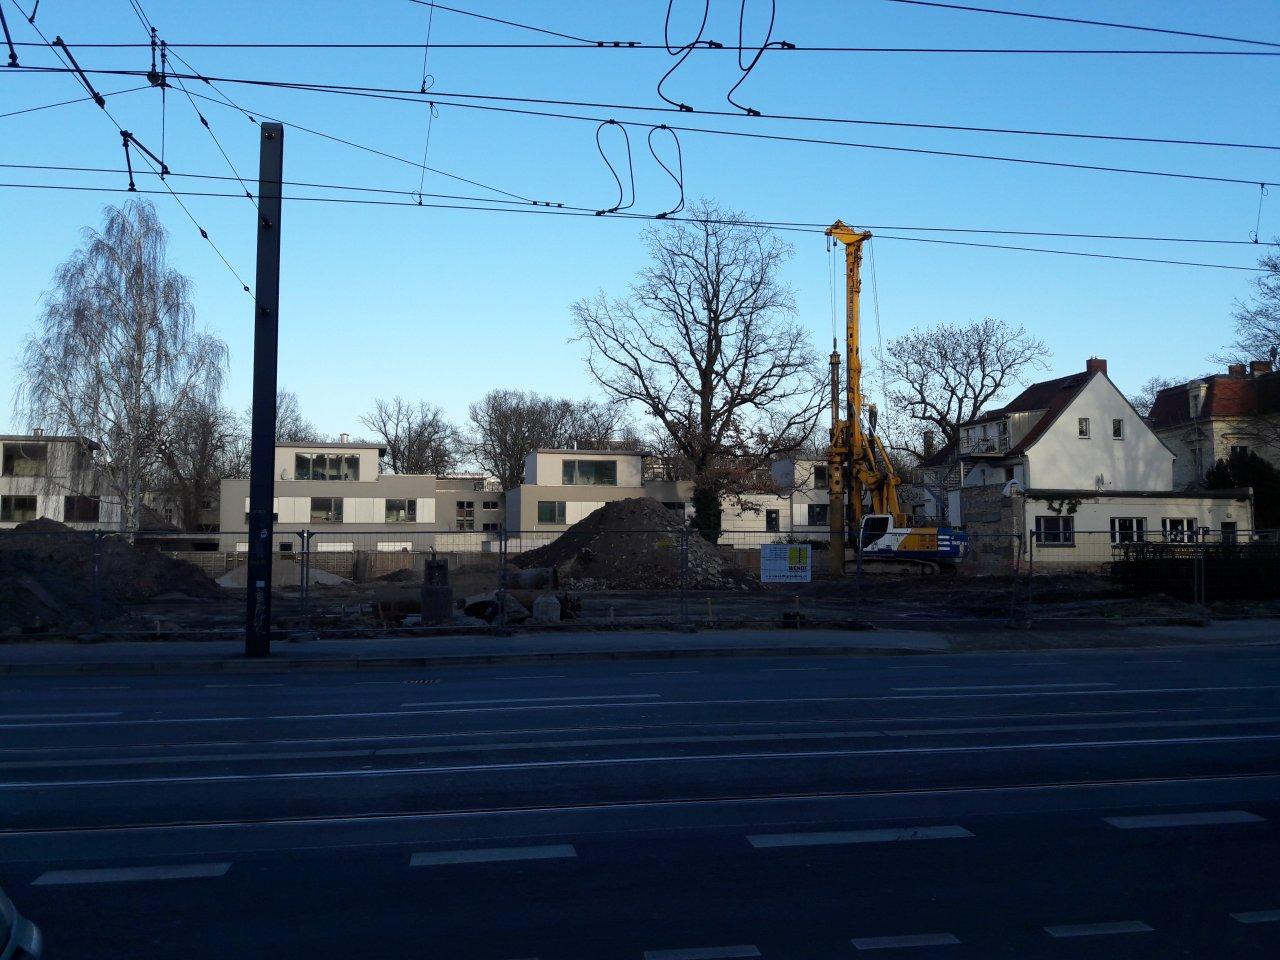 Berliner-Strasse-Pankow-Reha-Neubau.jpg